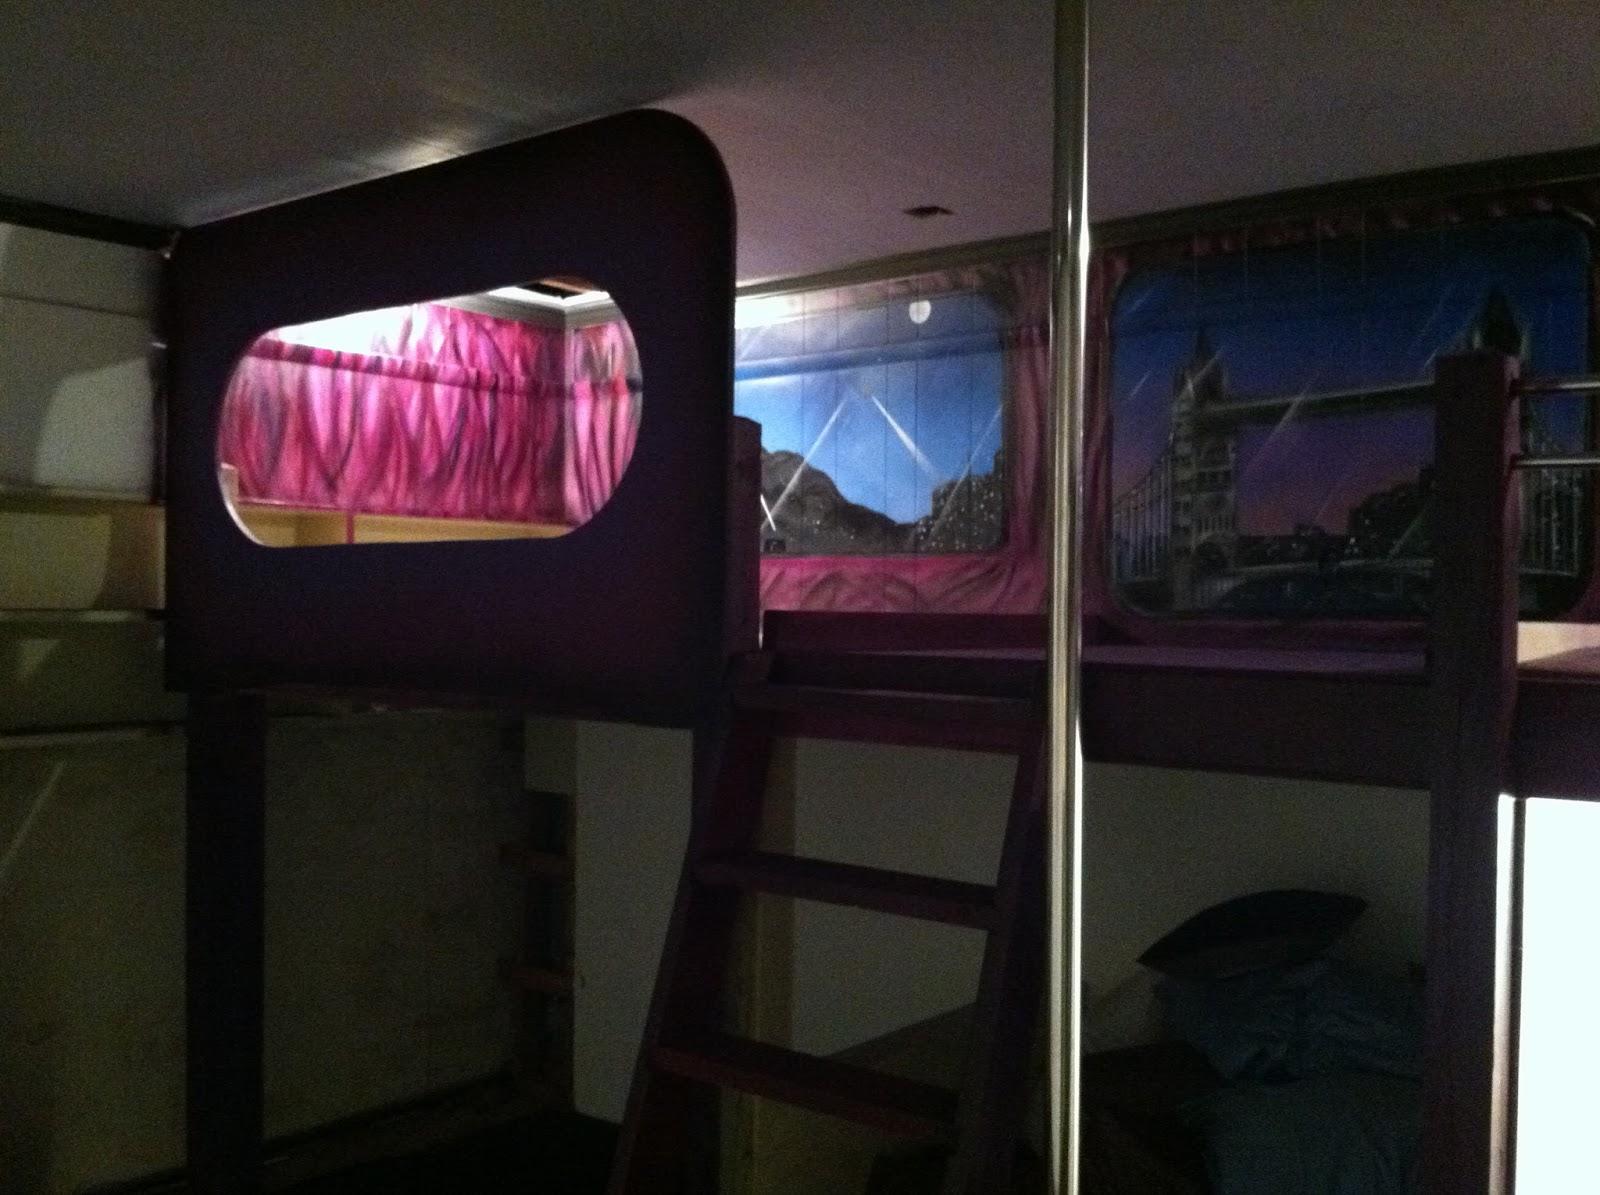 Duff Clothing Custom Tour Bus Bunk Bed Interior Mural